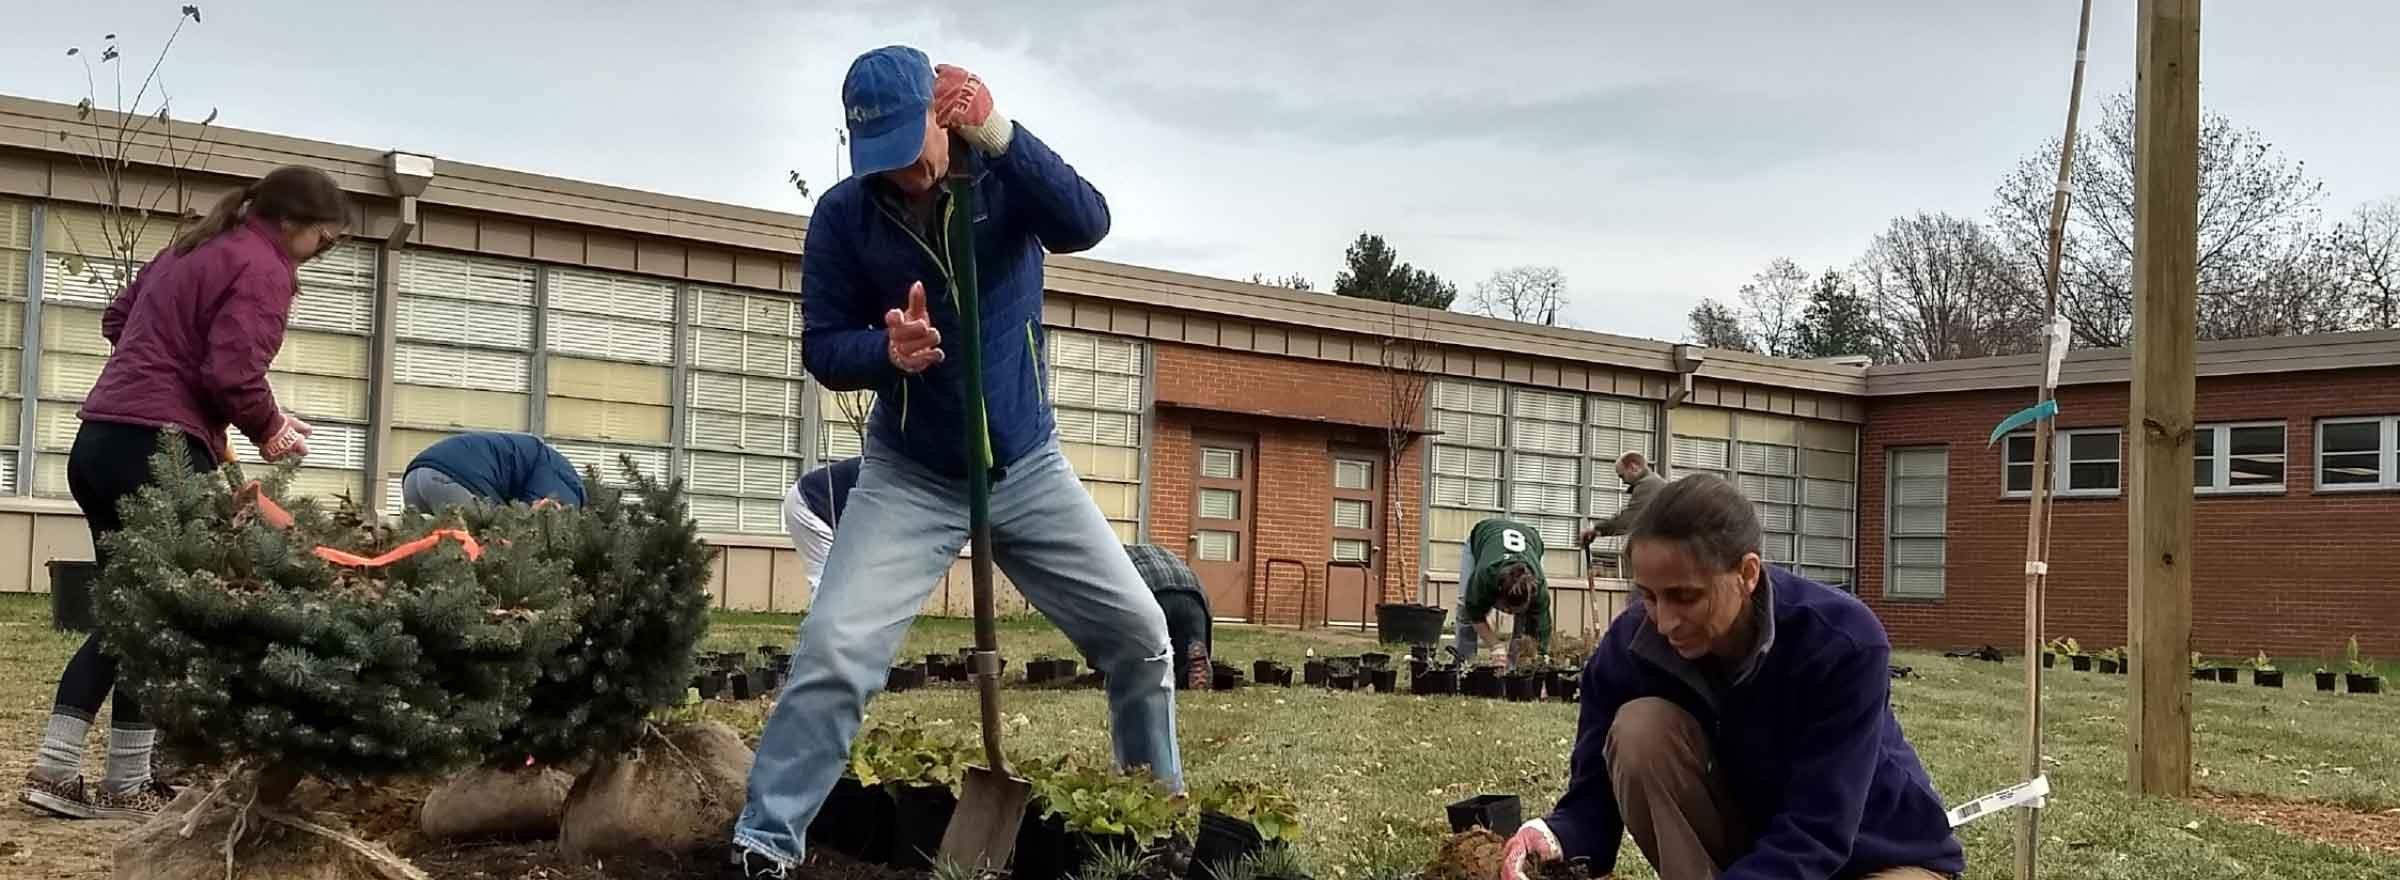 volunteers installing the new garden at Capitol Heights Elementary School